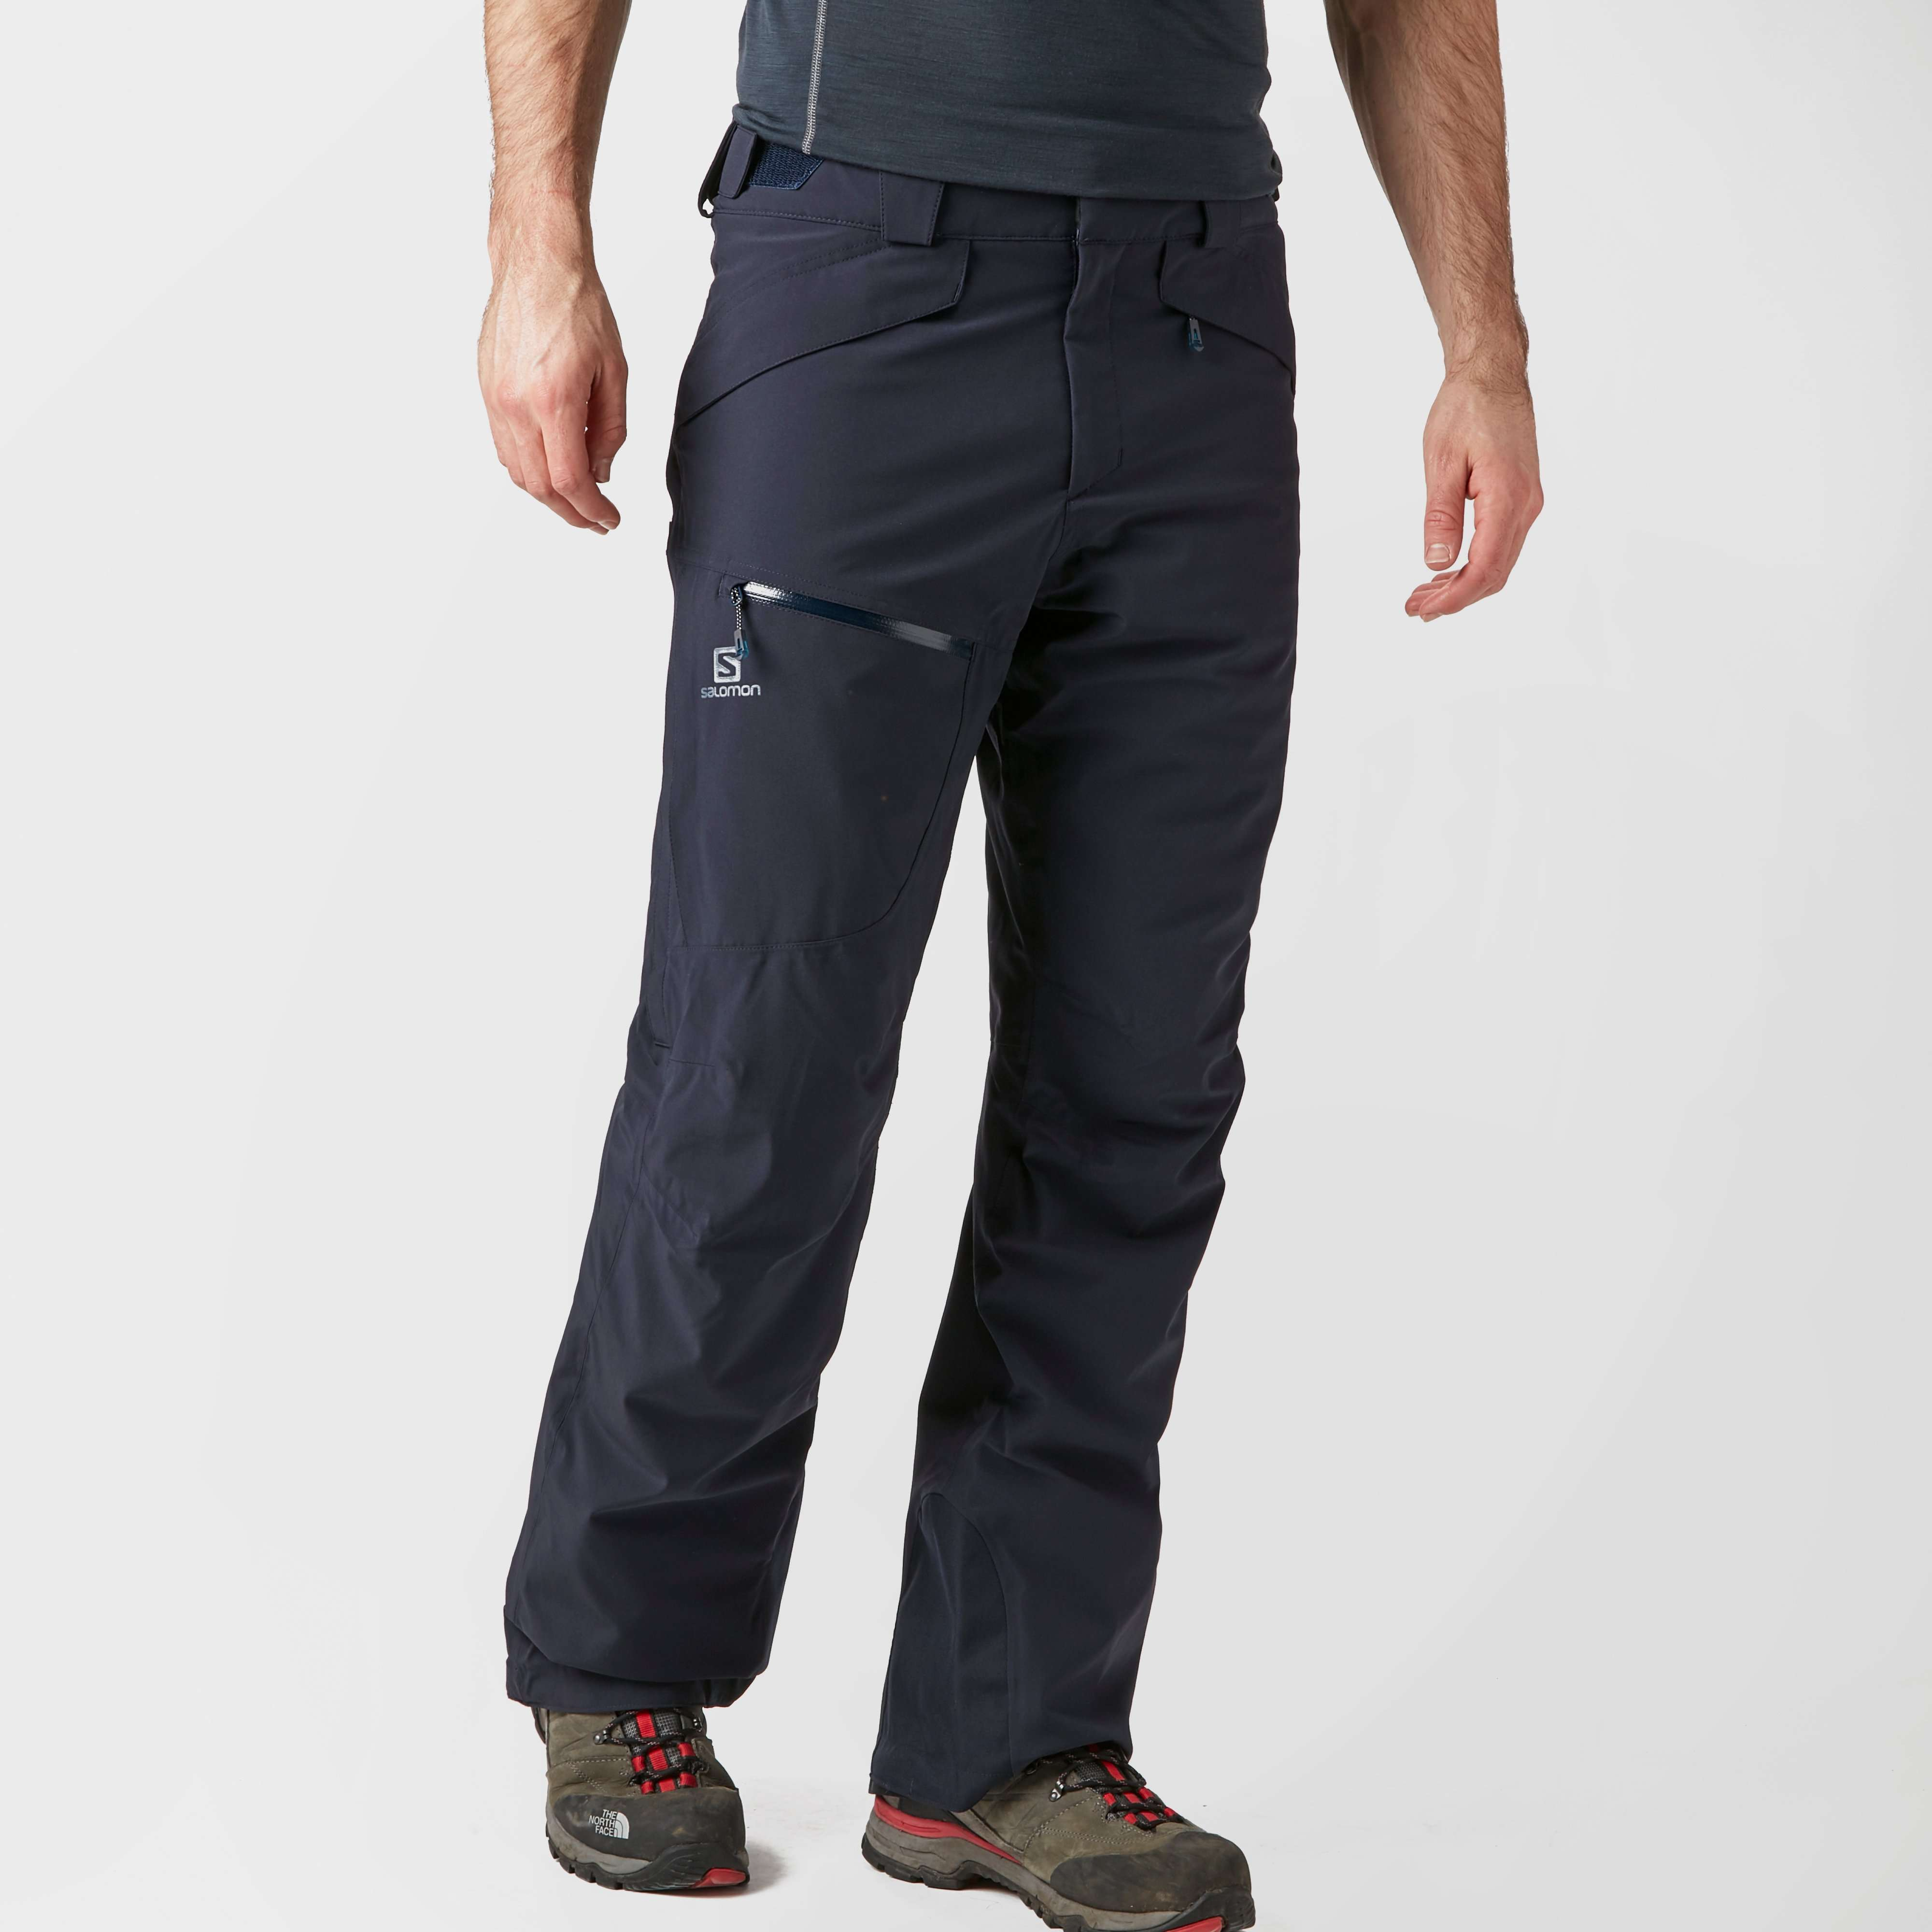 SALOMON Men's Brilliant Ski Pant